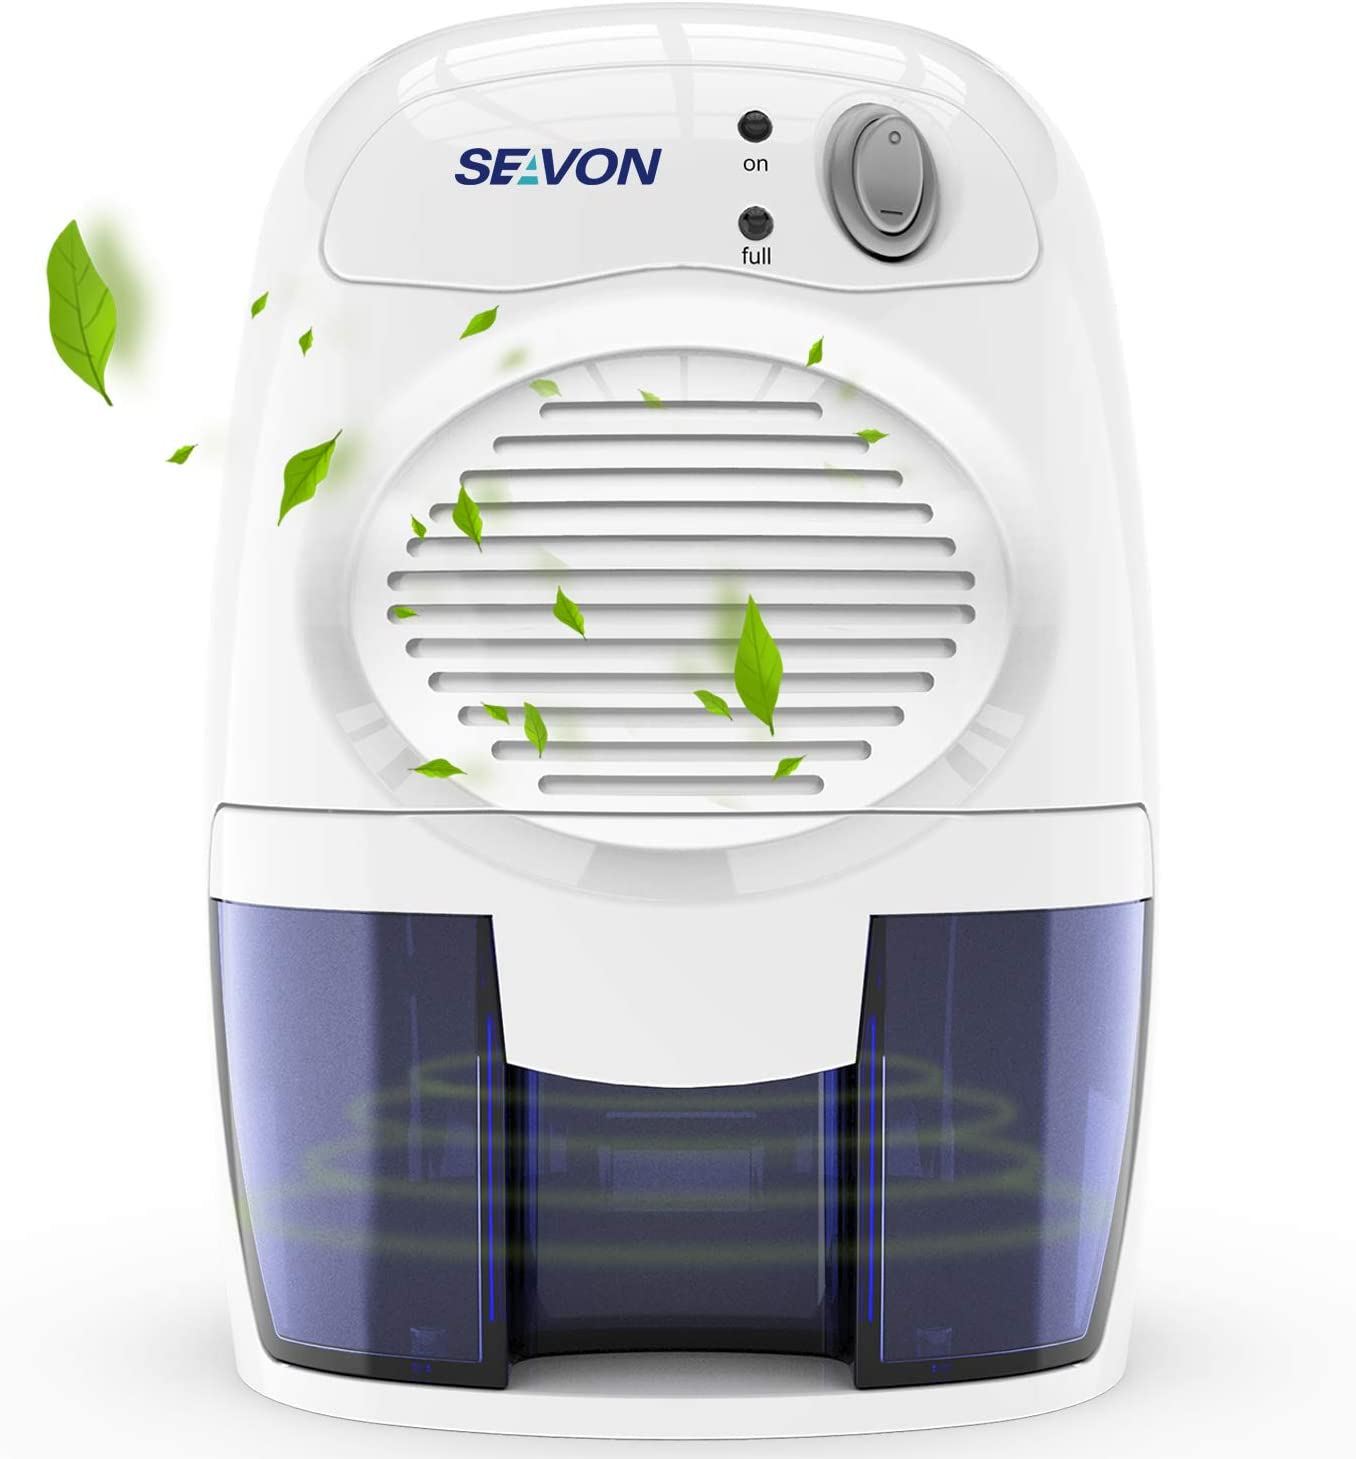 SEAVON New Electric 2020 Mini Dehumidifier, 1500 Cubic Feet (170 sq ft) Portable and Compact 500ml